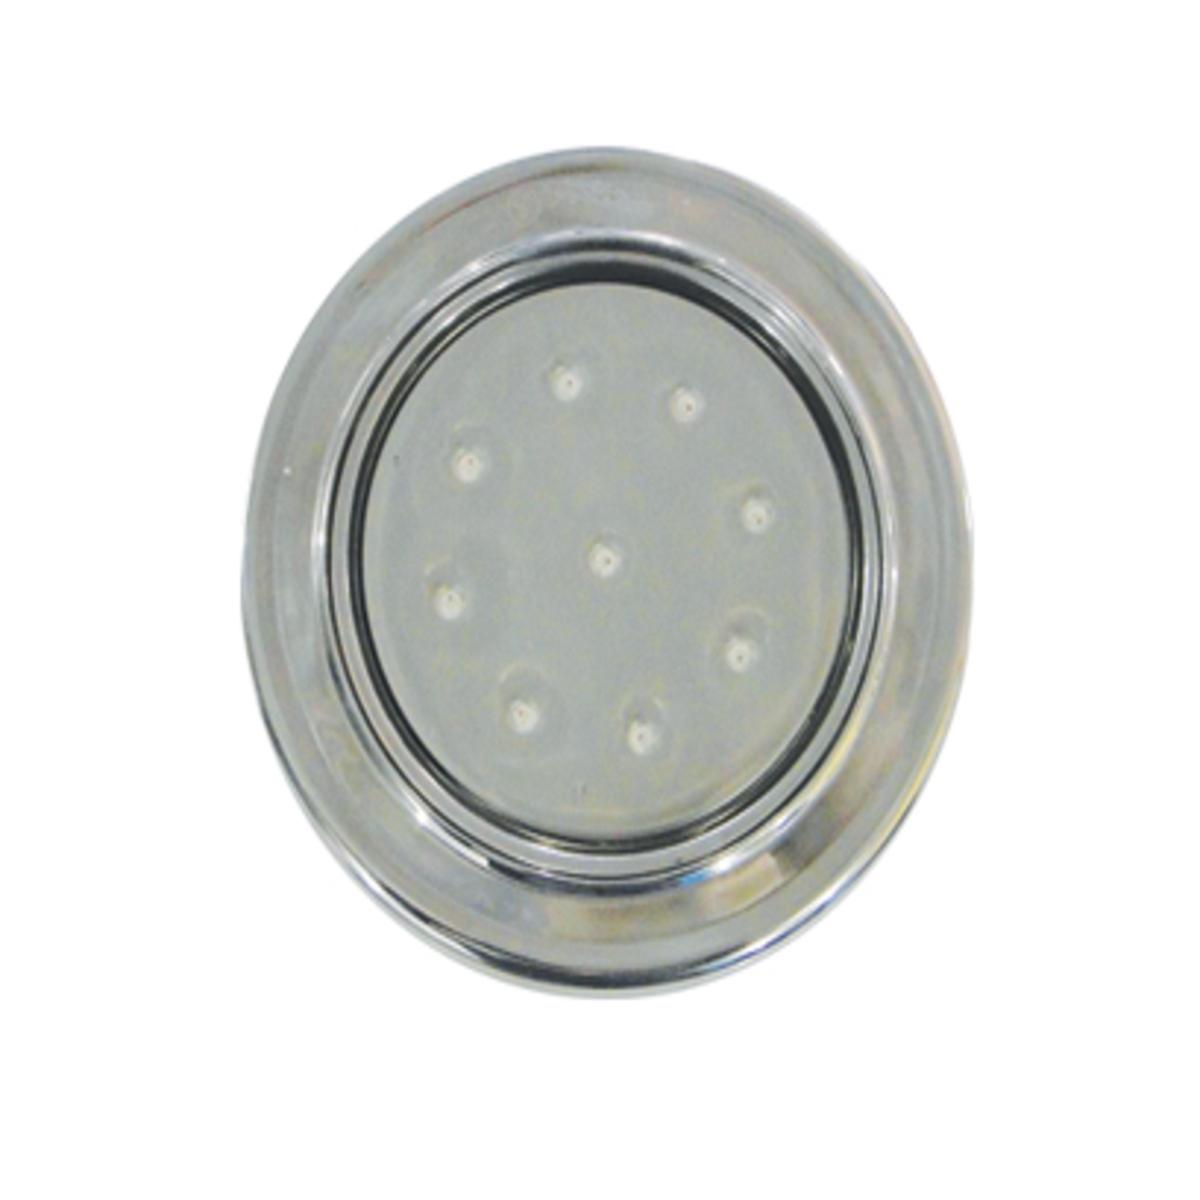 "Refletor Steel Super Led 9 Luz branca Inox com Plug 1/2"" Pooltec"